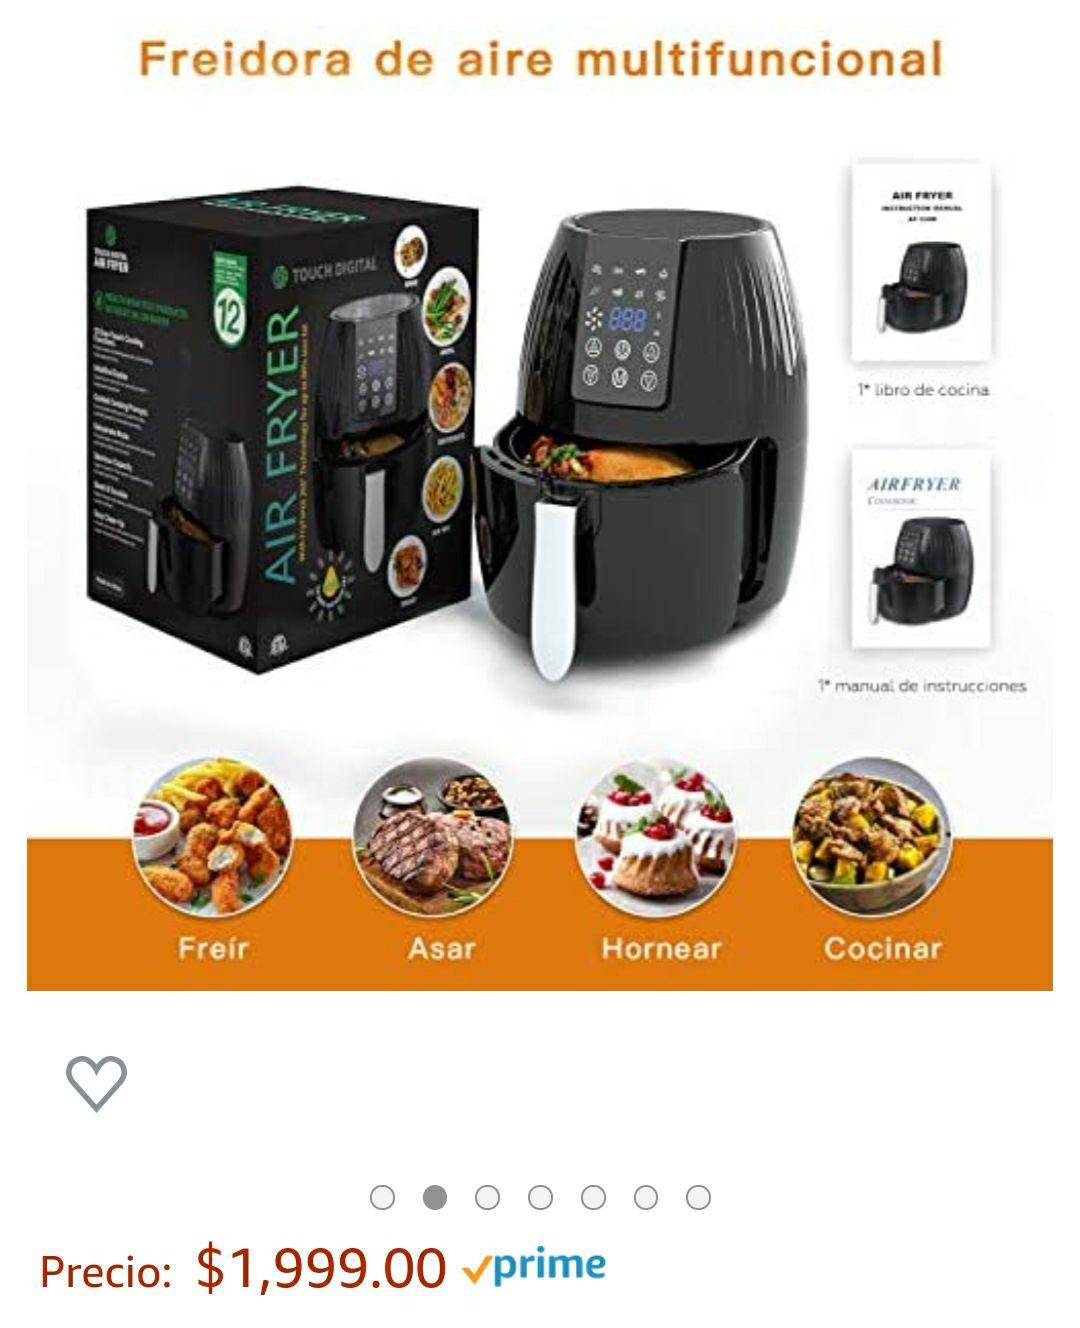 Amazon: Freidora de aire 5.5 lt